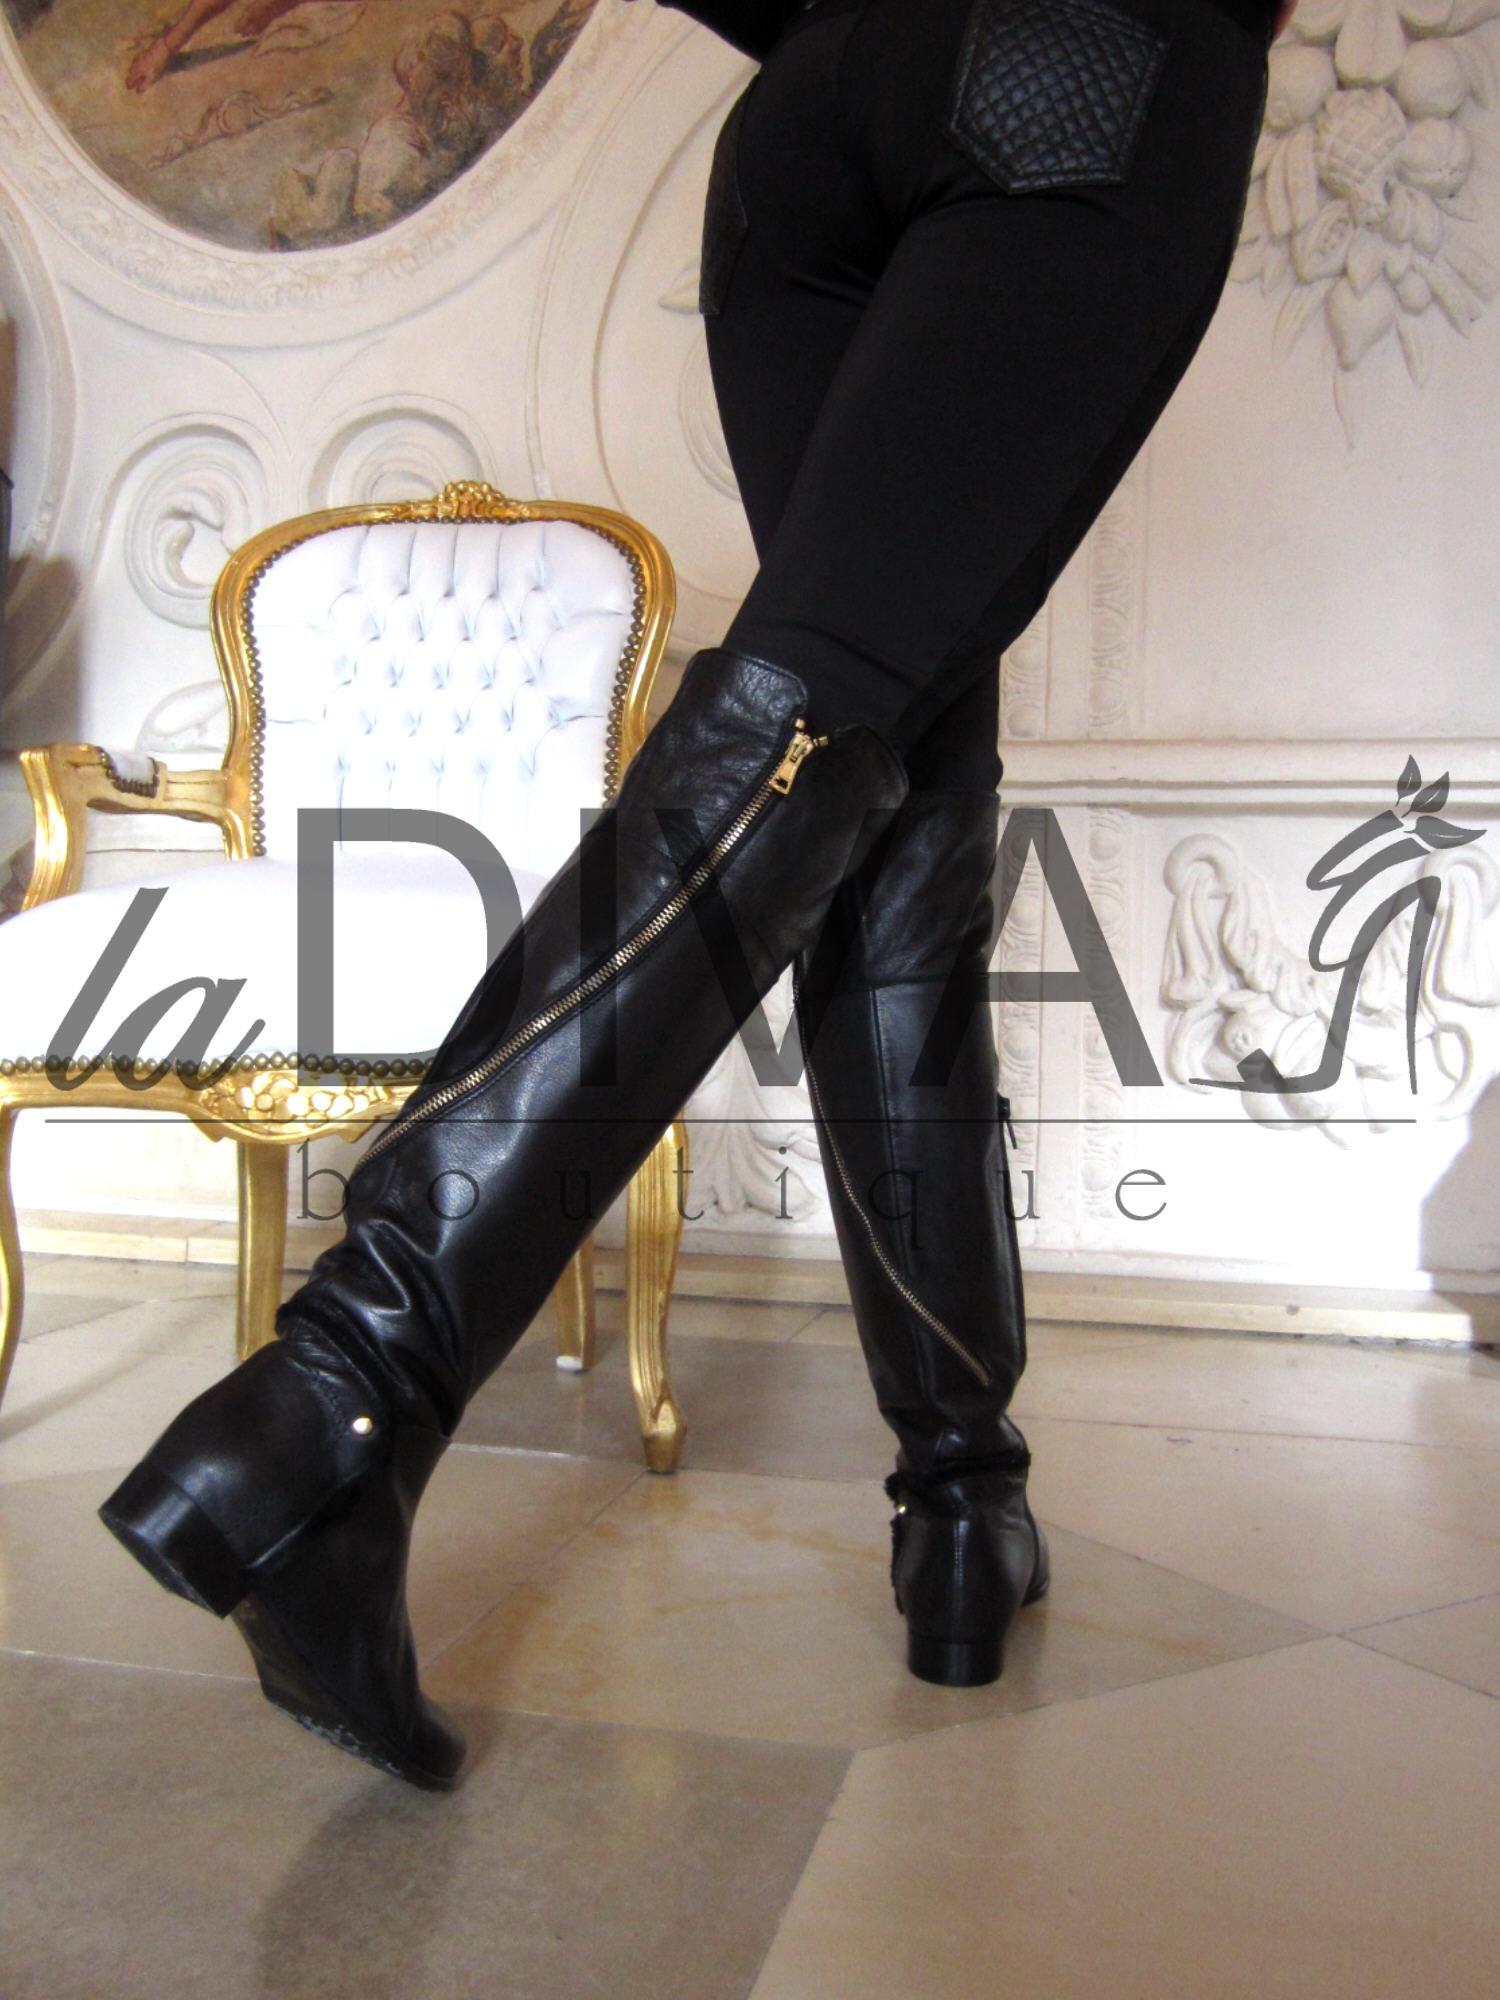 napoleoni designer italy fell stiefel leder 40 zipper overknee boots schwarz ebay. Black Bedroom Furniture Sets. Home Design Ideas